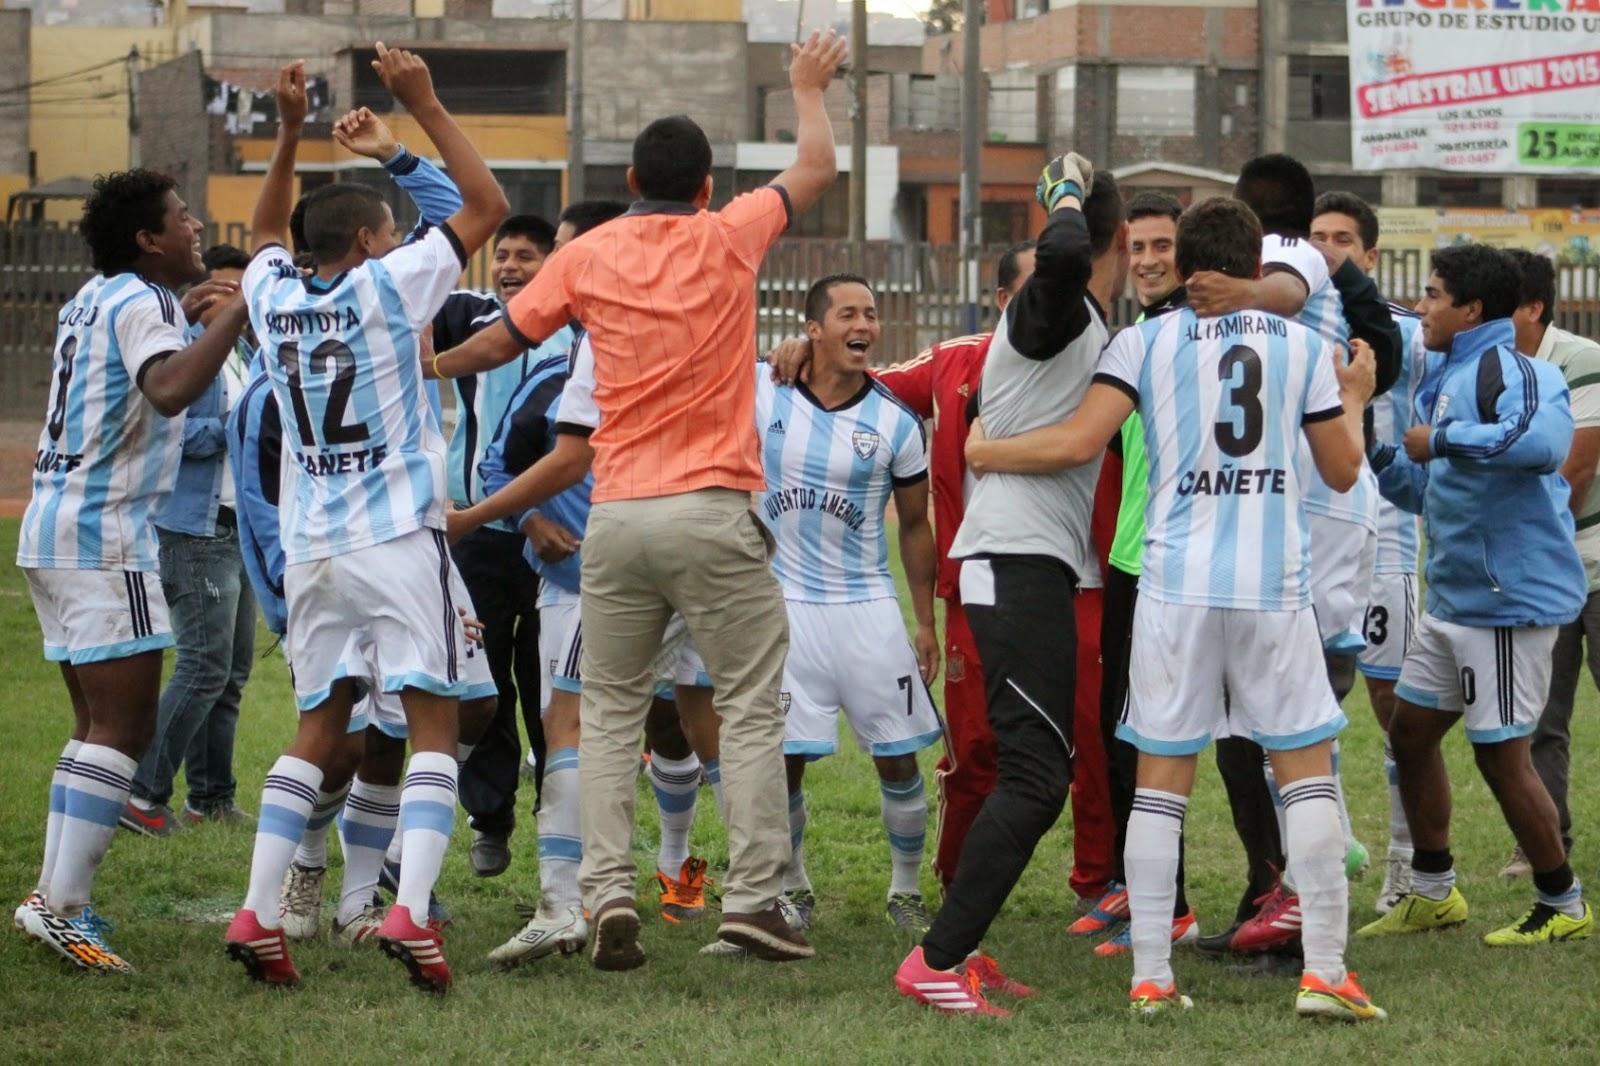 http://tribunal-deportivo.blogspot.com/2014/10/conoce-un-poco-mas-de-juventud-america.html